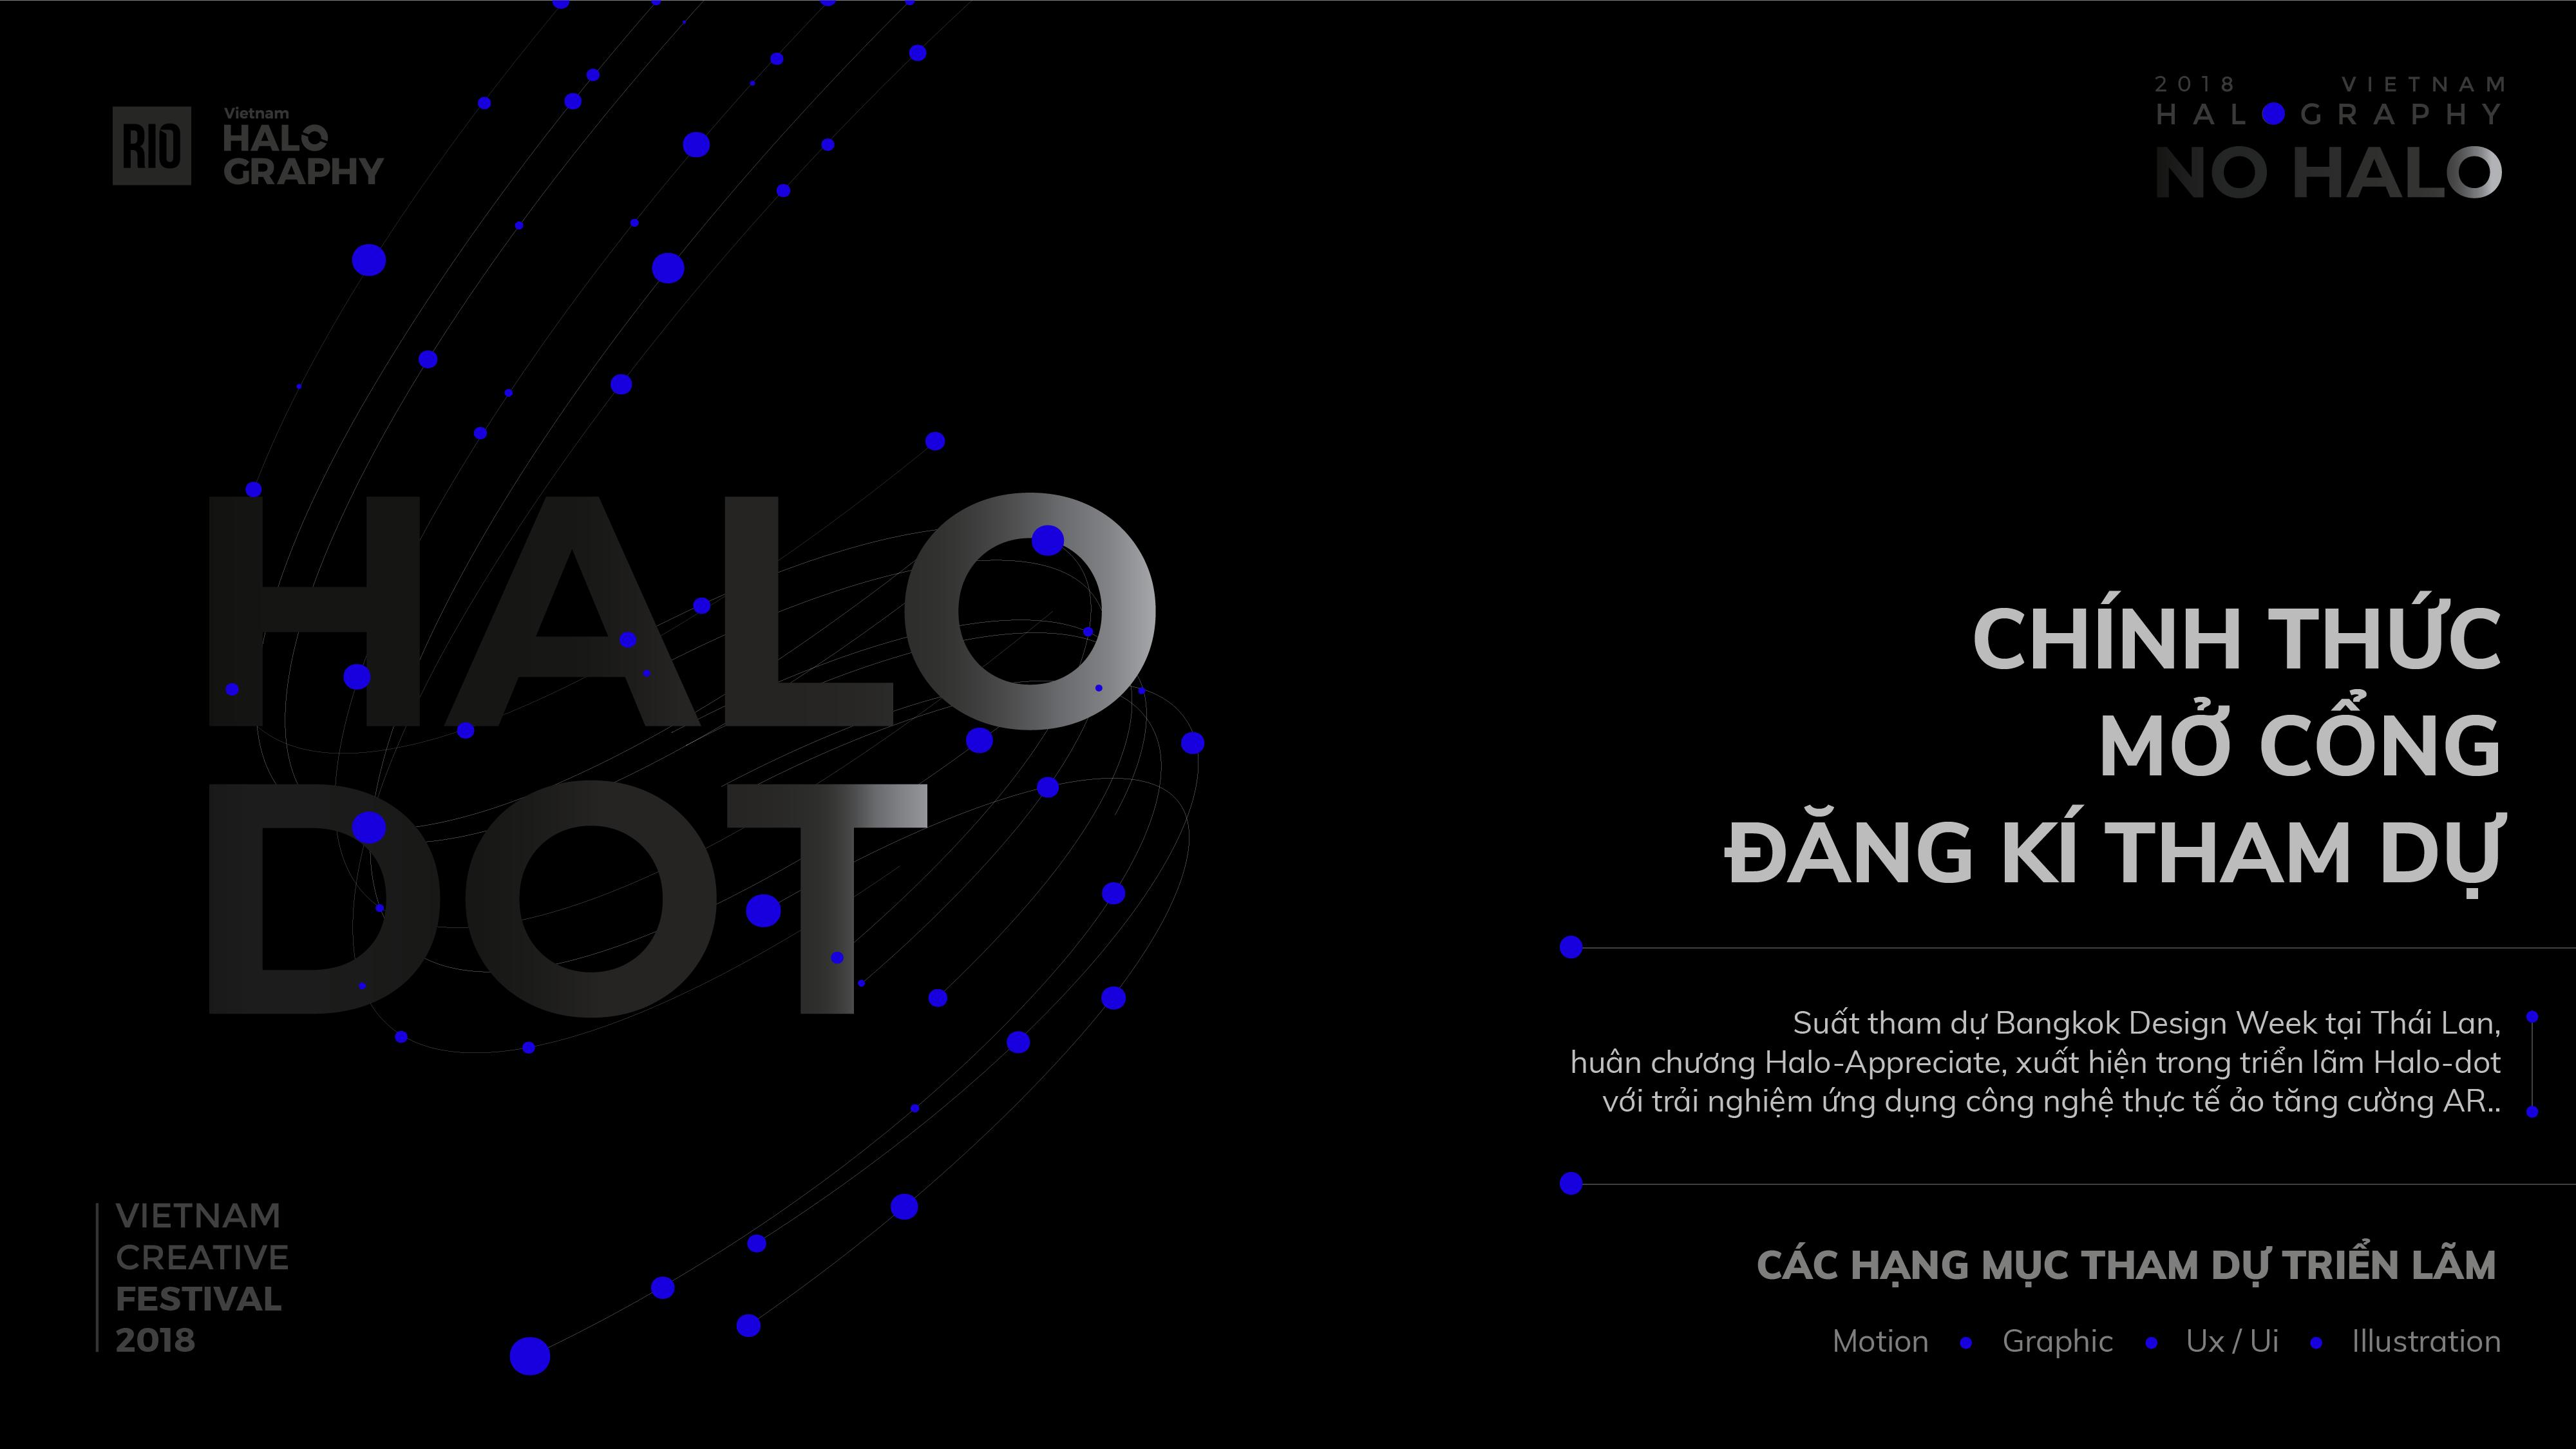 Halo-dot no halo-01